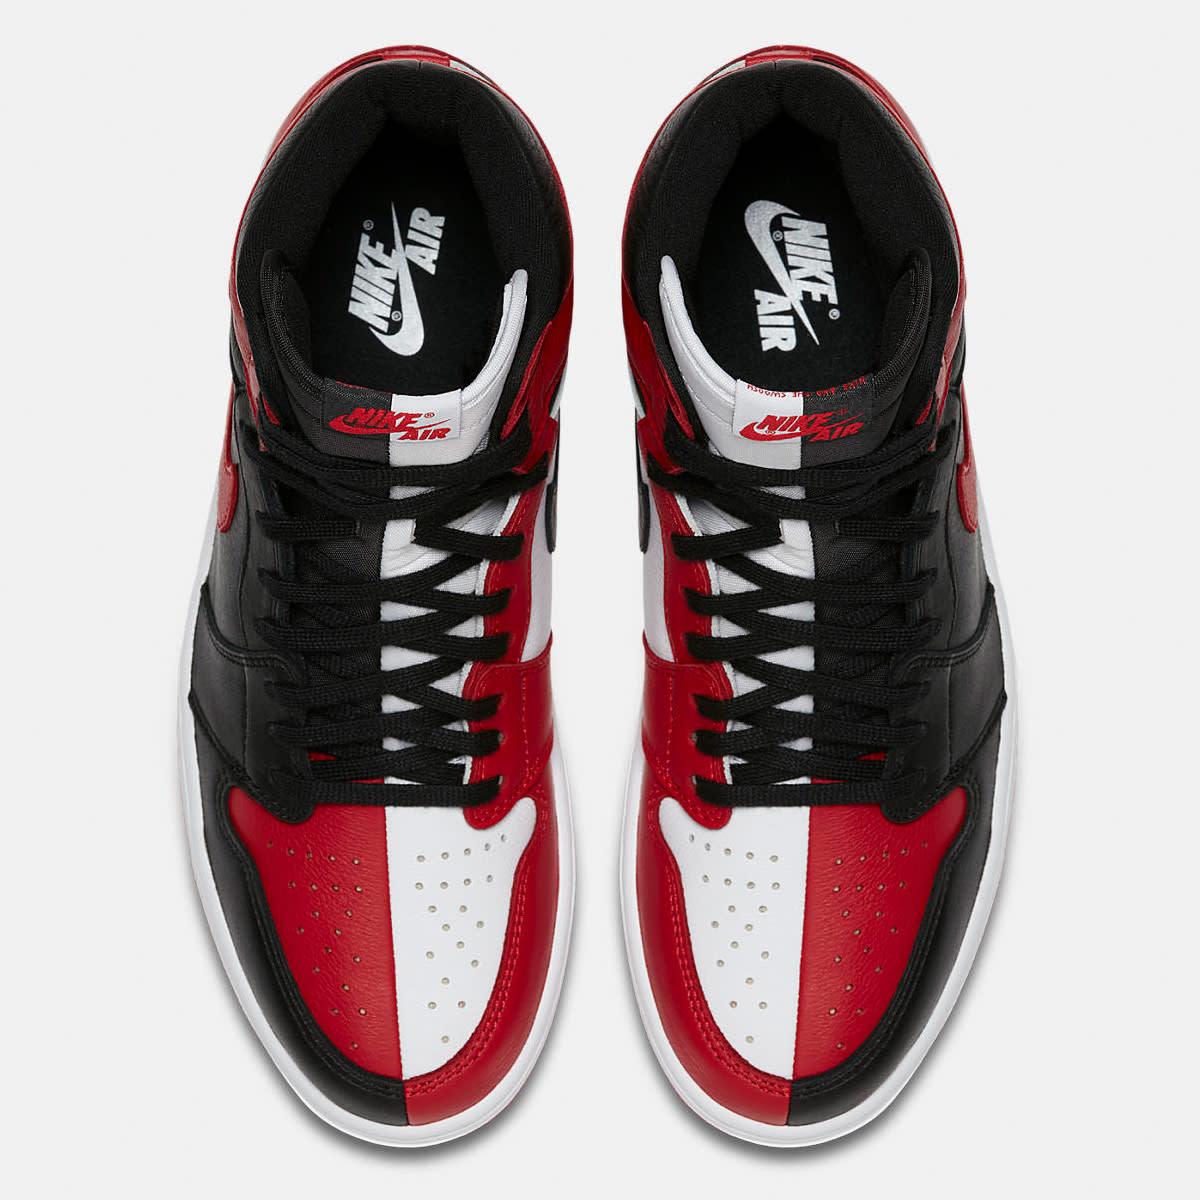 Nike Air Jordan 1 Retro High OG NRG